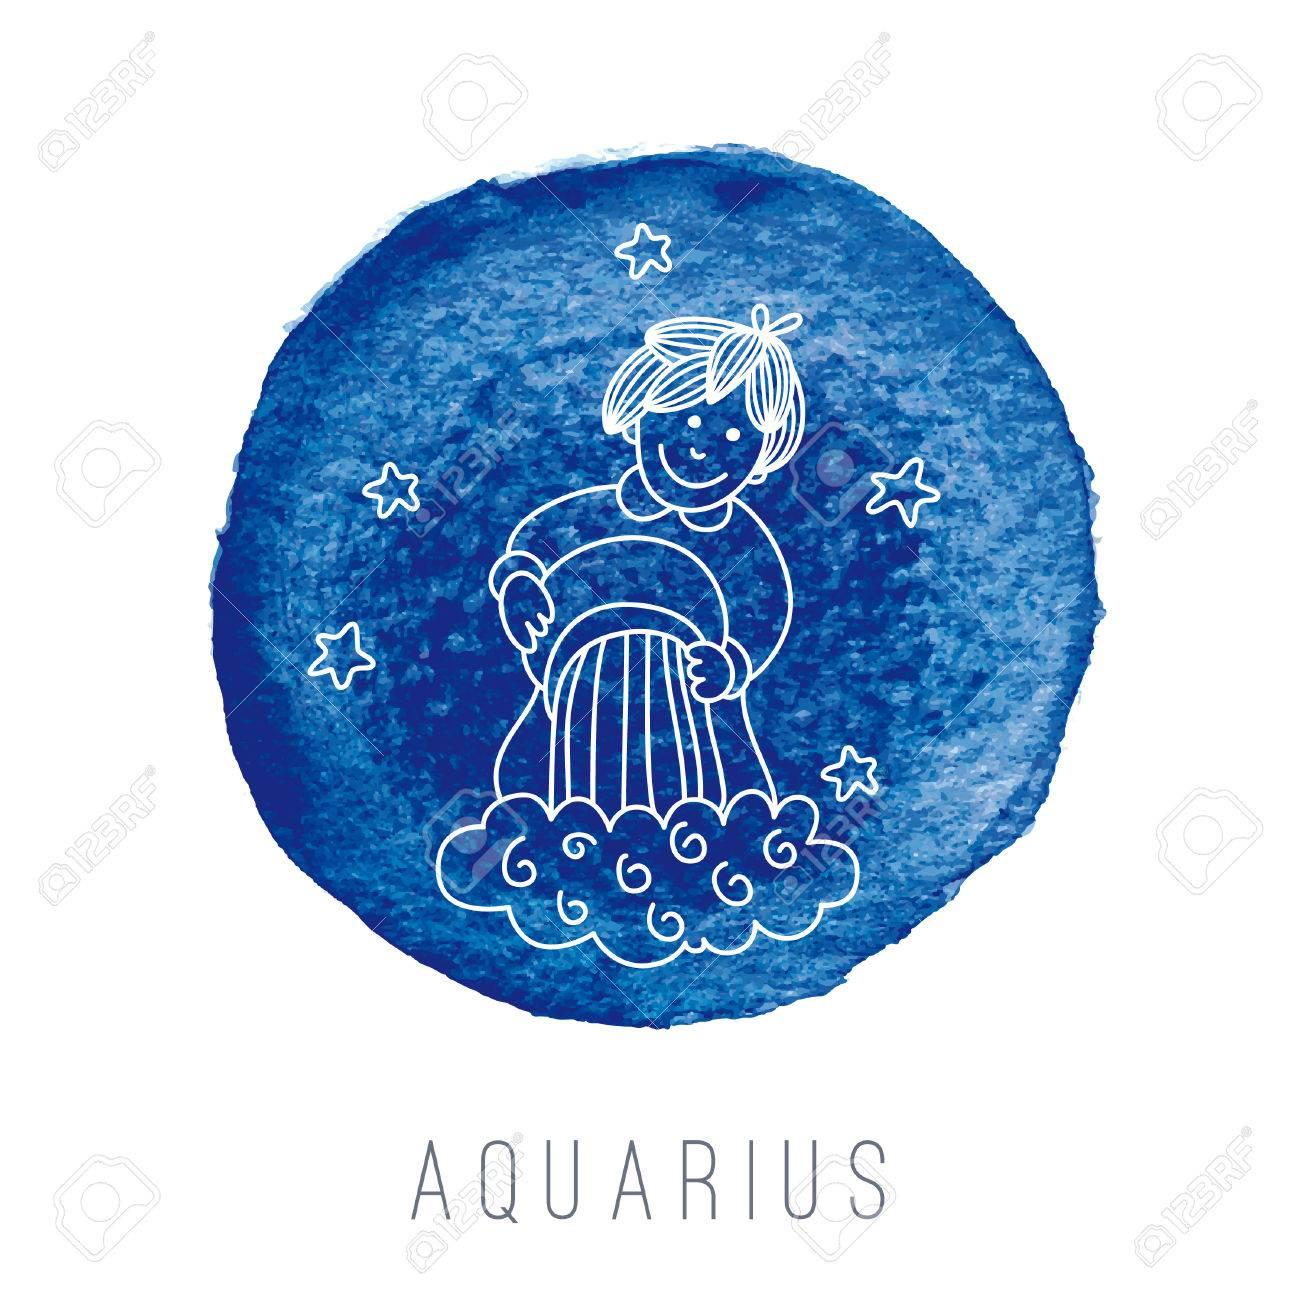 Vase water bearer symbol view symbol biocorpaavc Choice Image